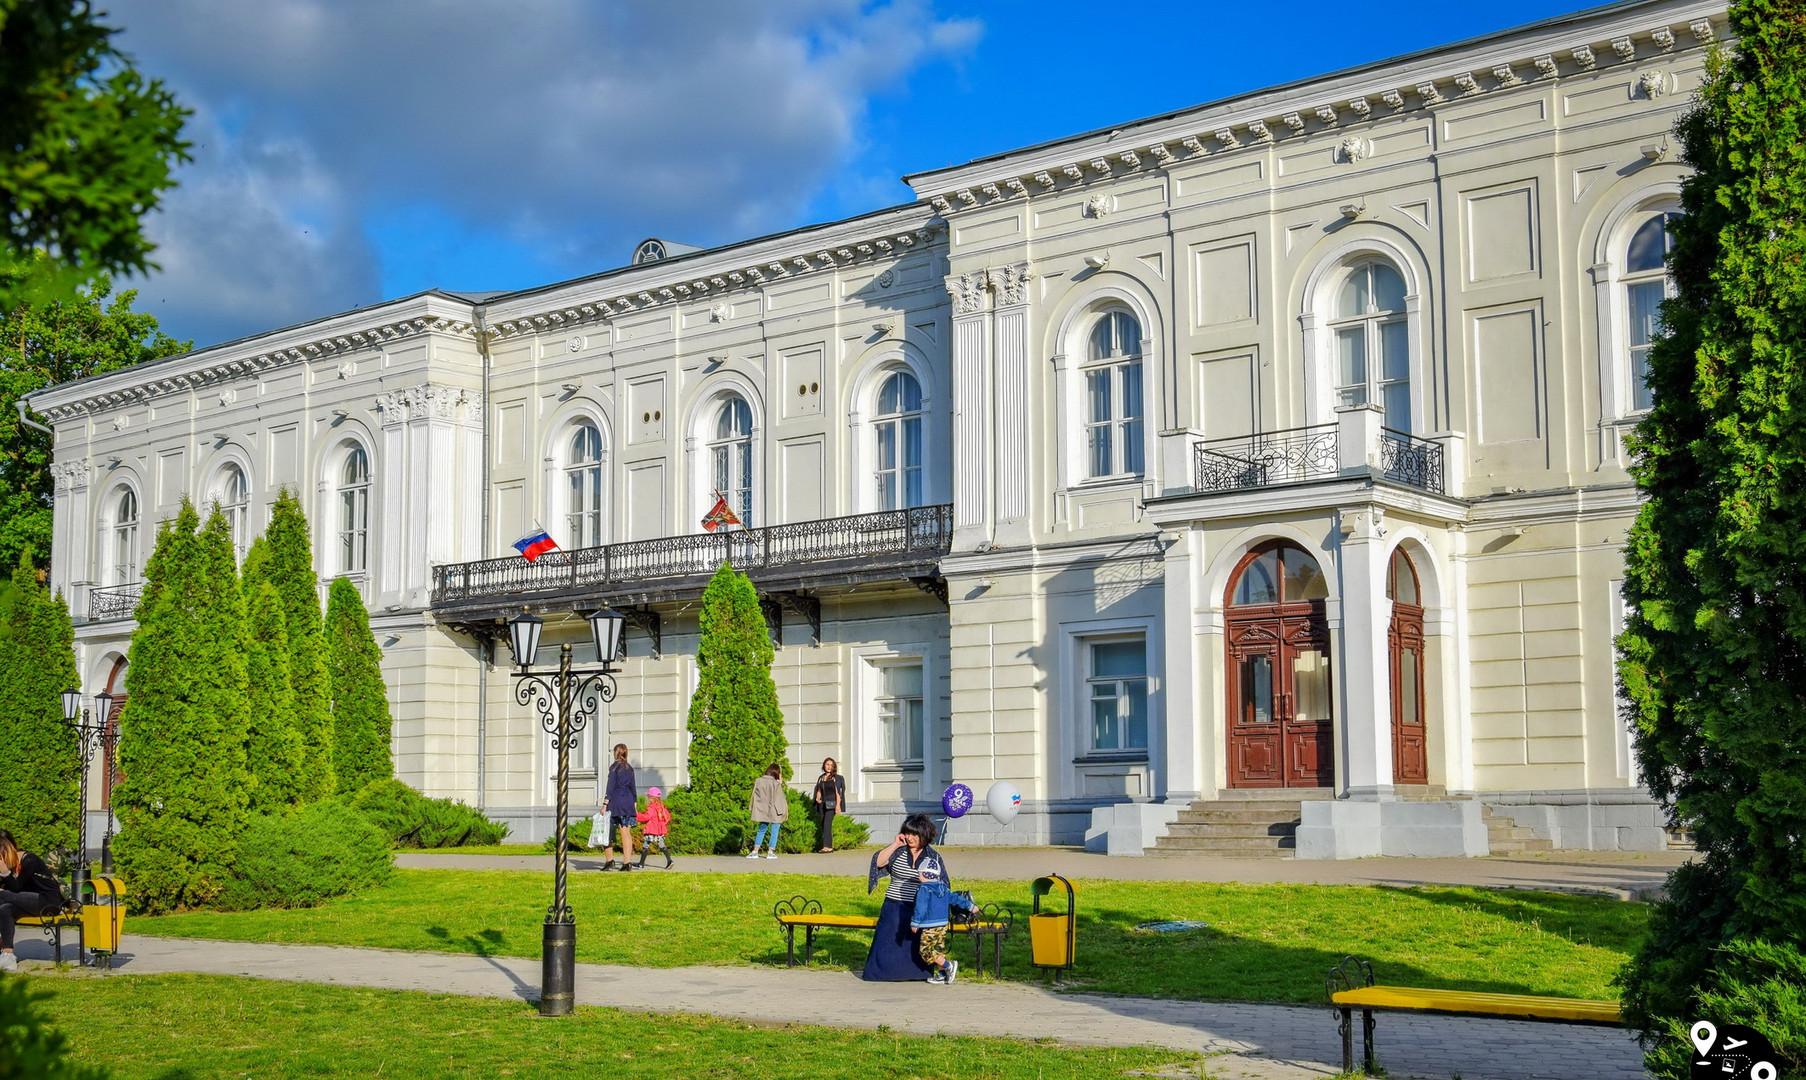 Дворец атамана, Новочеркасск